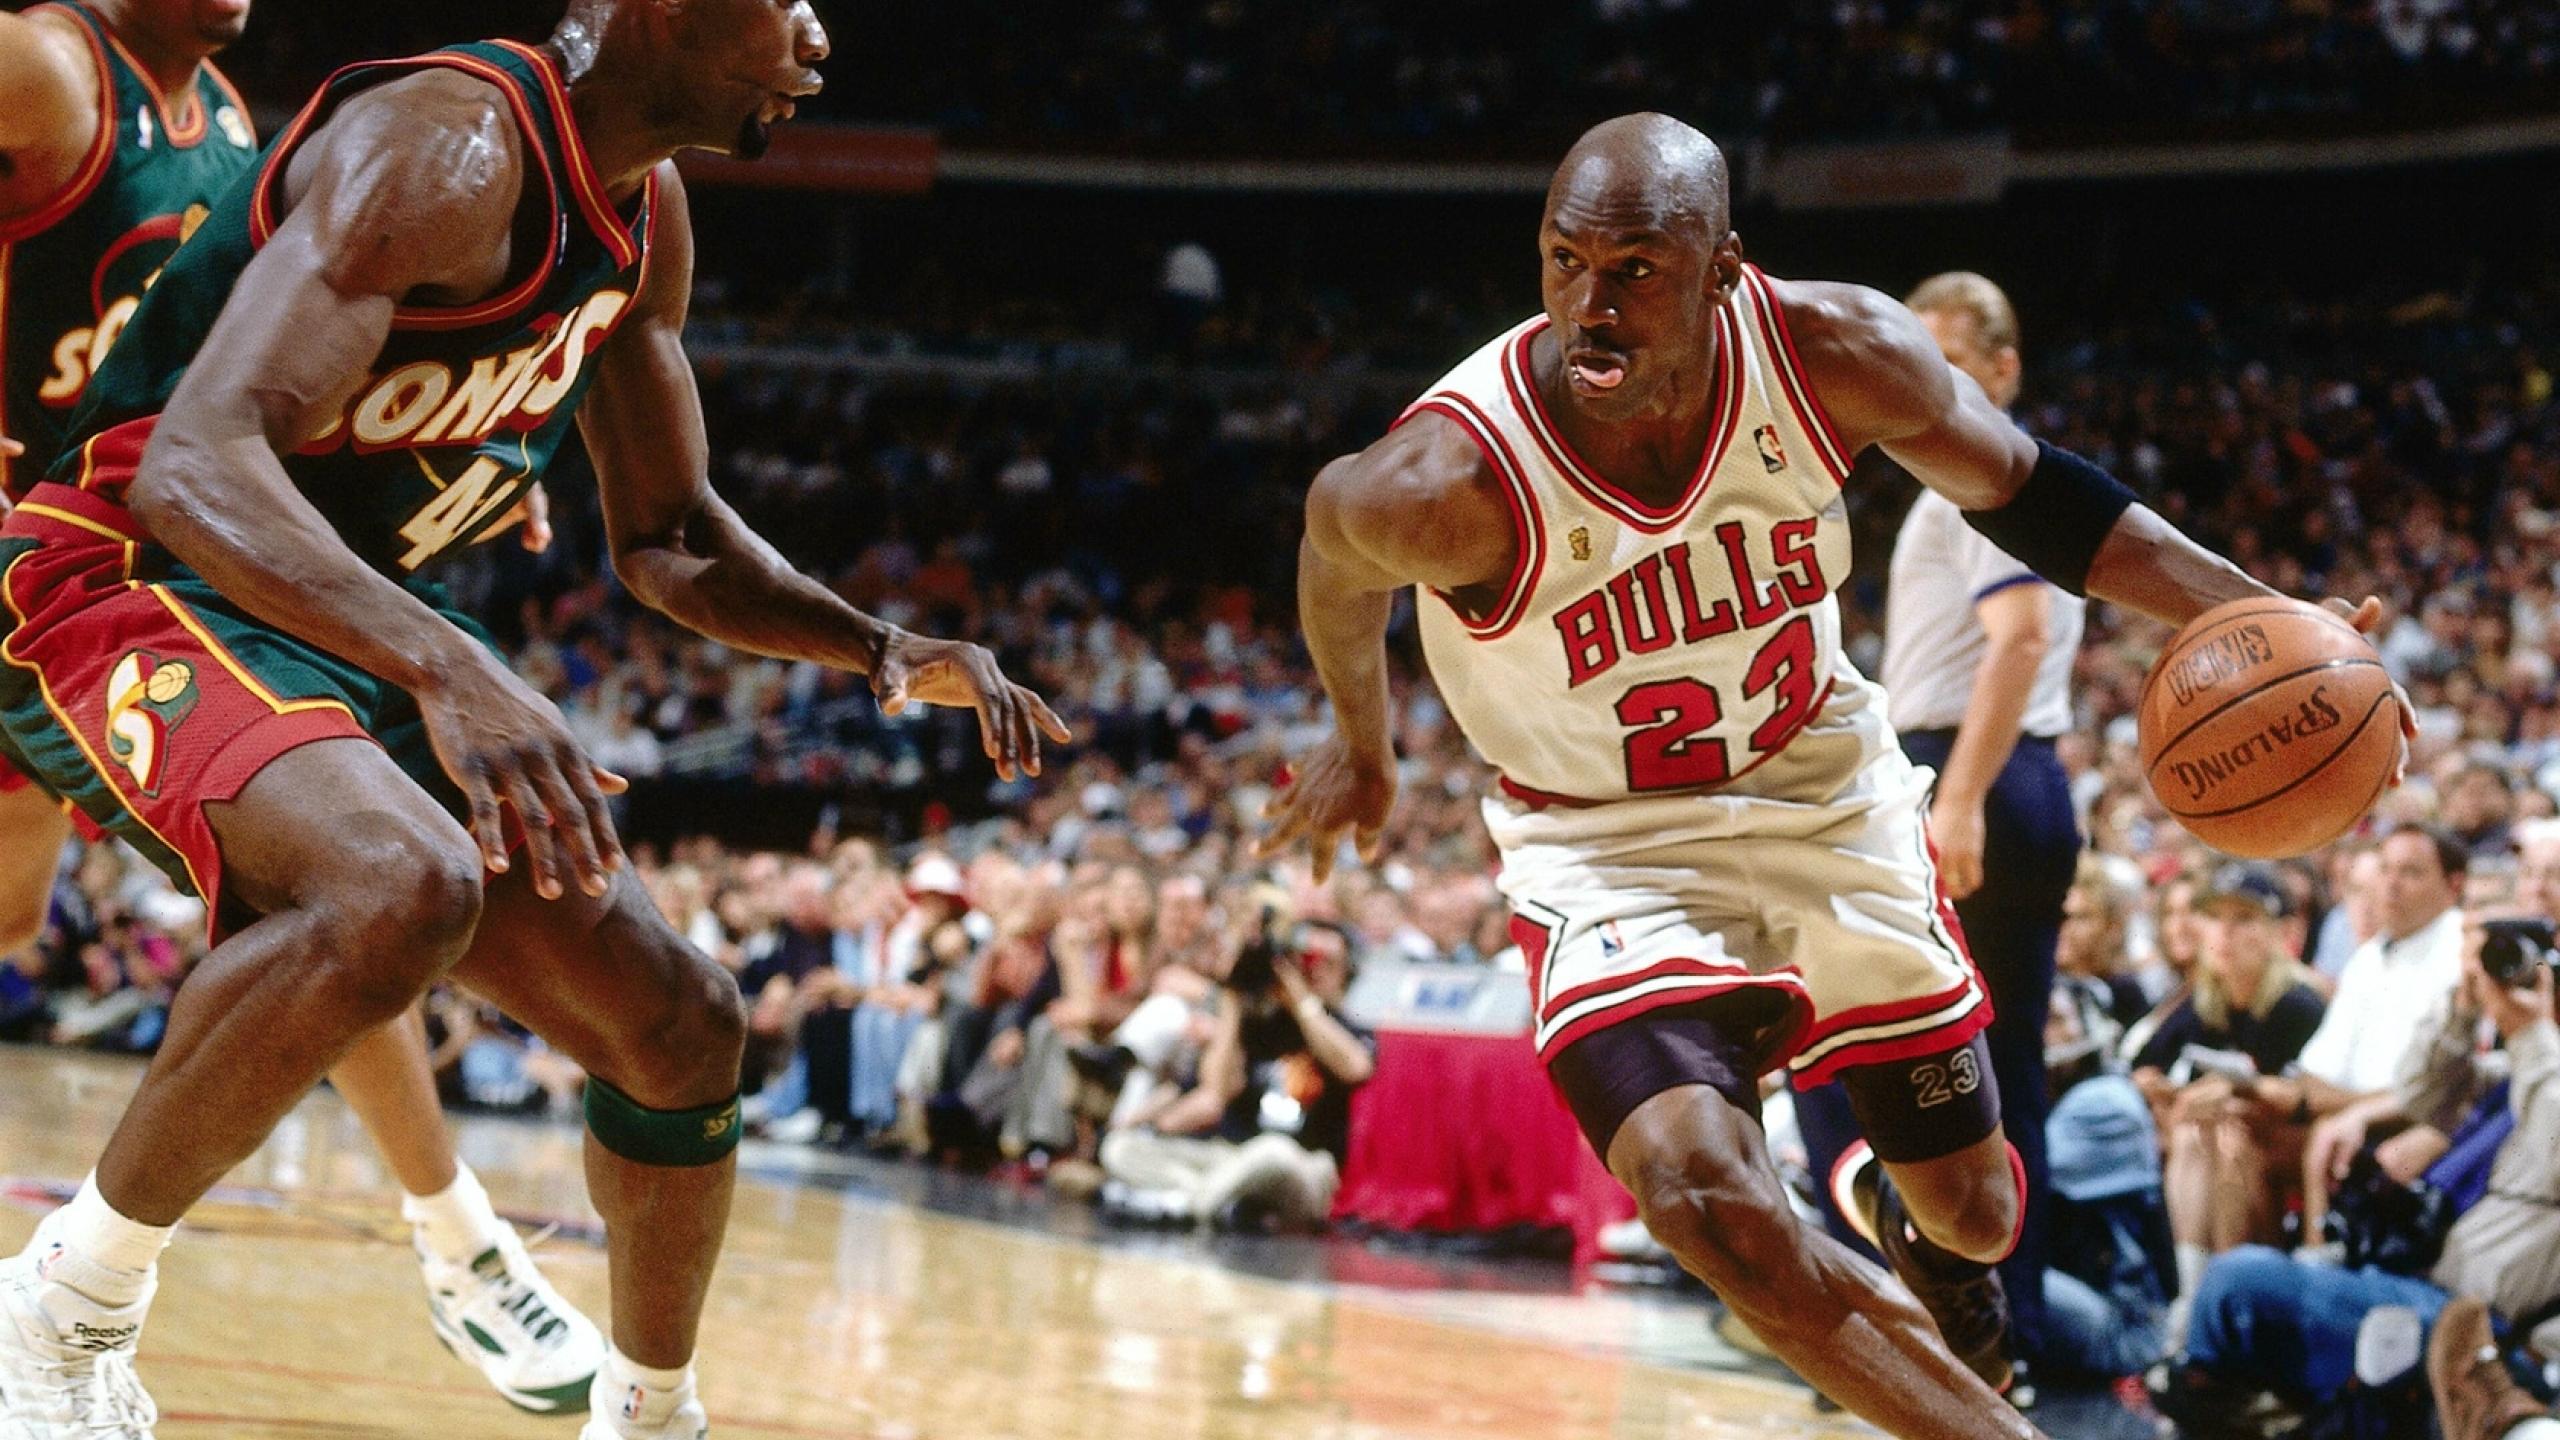 2560x1440 Nba Michael Jordan Basketball 1440p Resolution